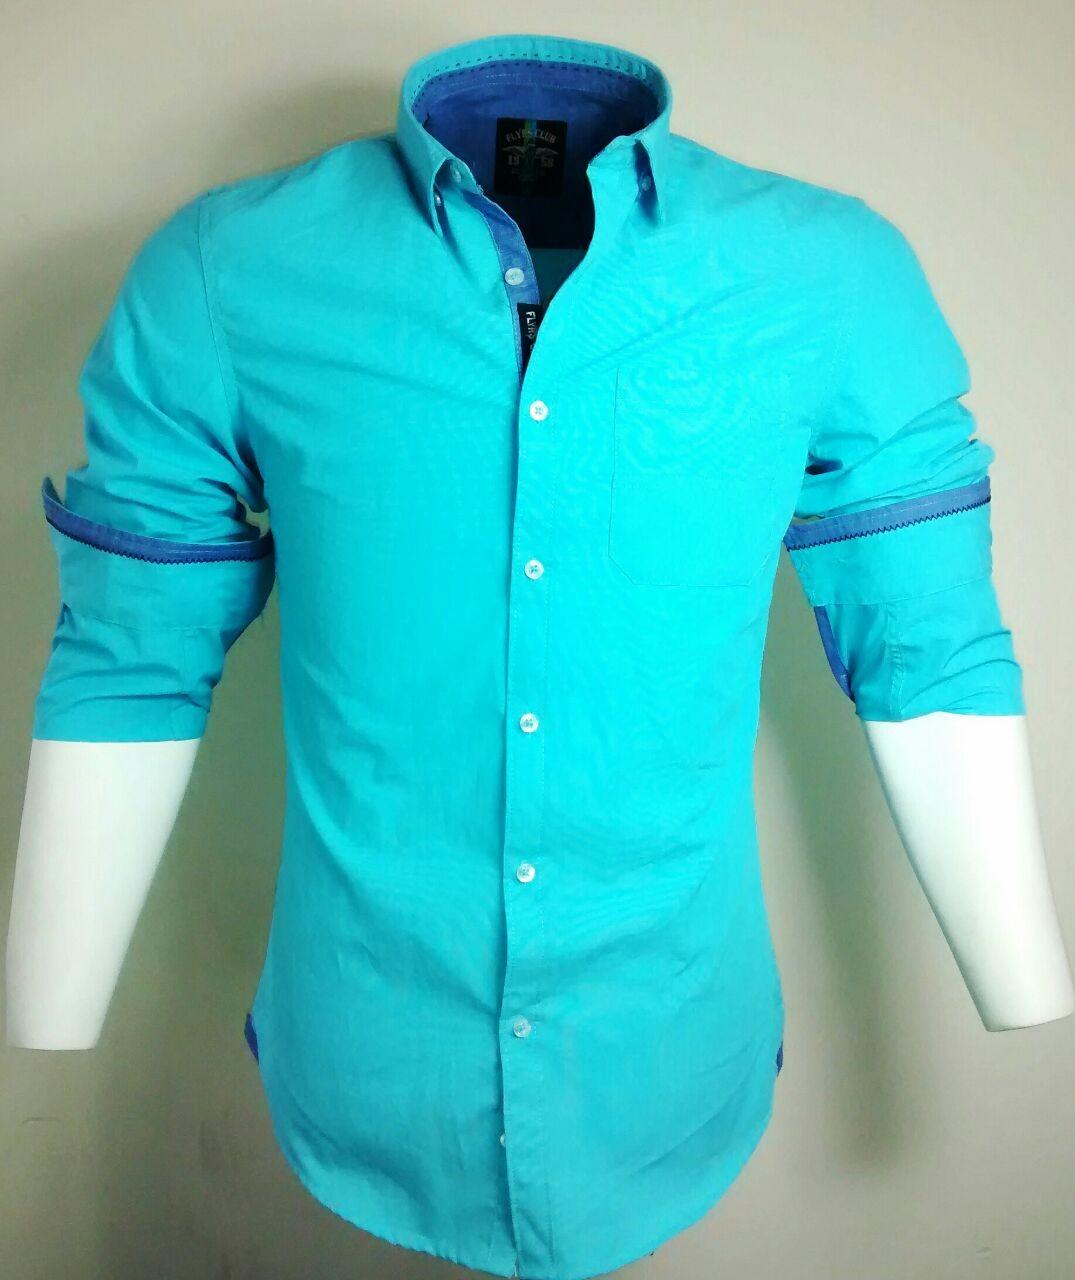 Casual Cotton Aqua Stripes Shirt